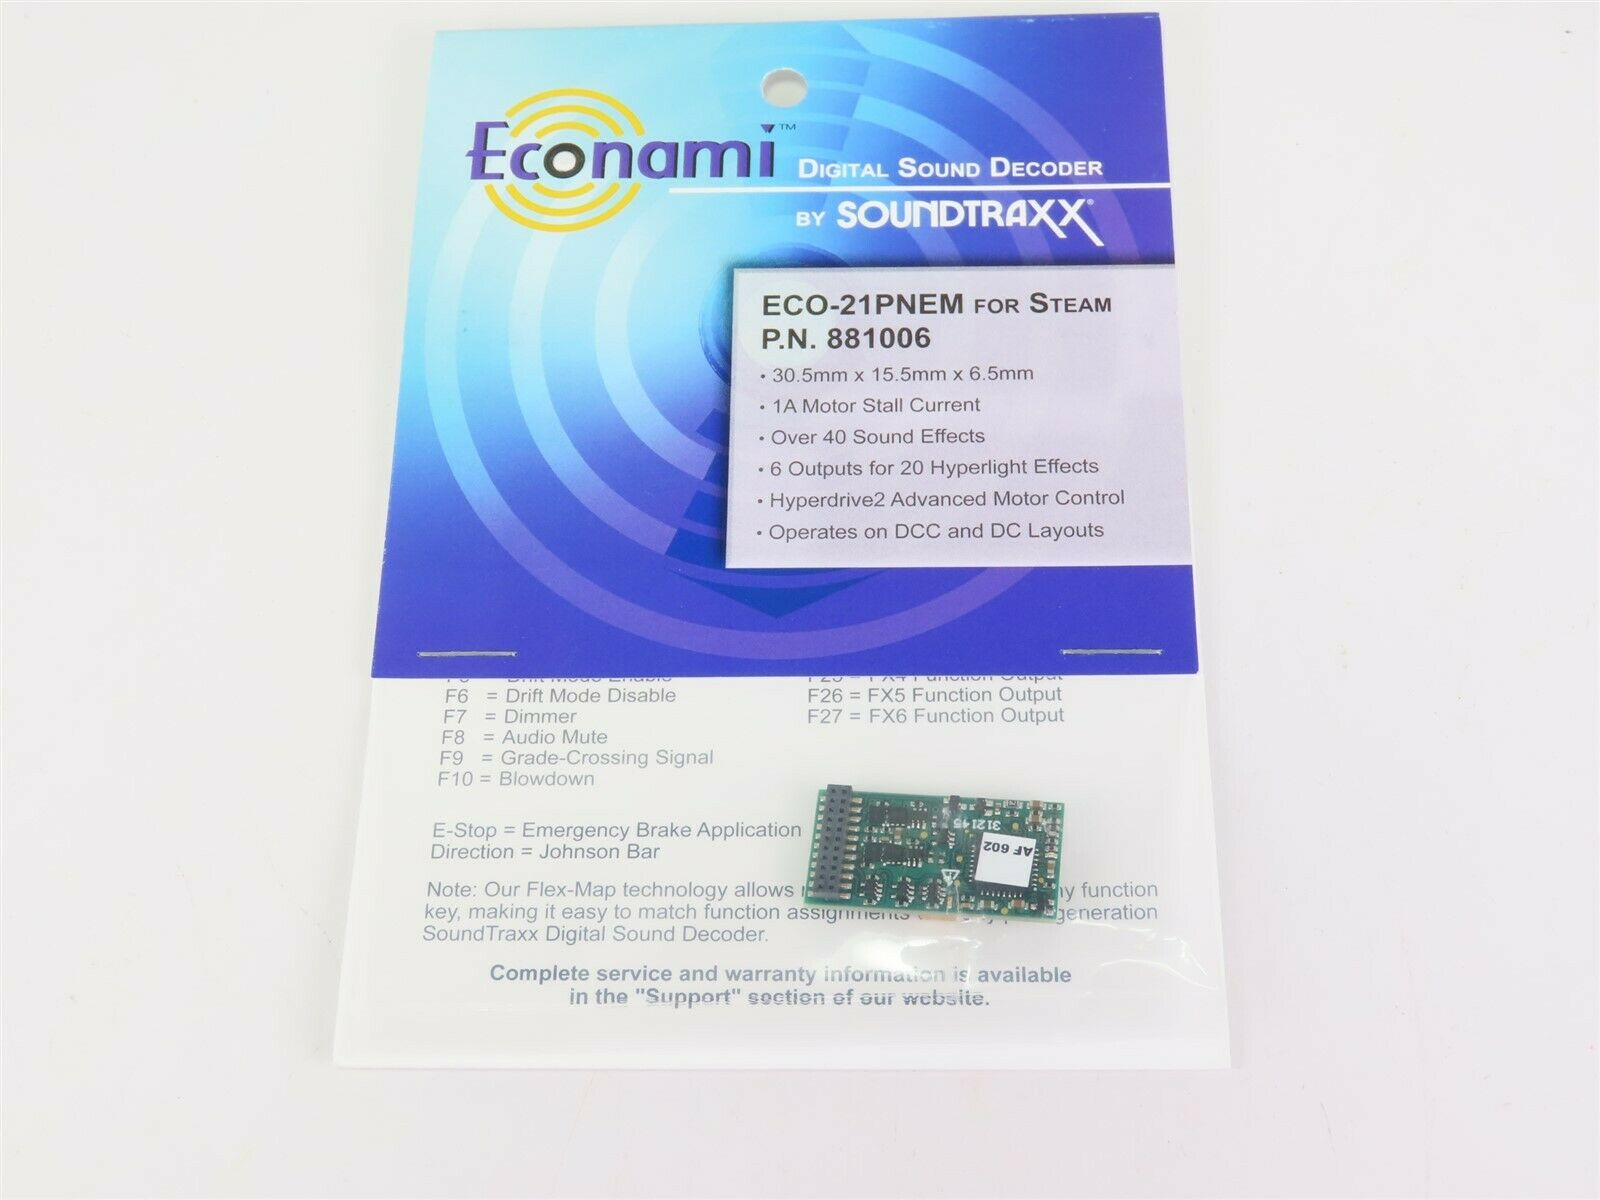 suonotraxx econami ECO 21 pnem 881006 vapore DCCsuono Decodificatore